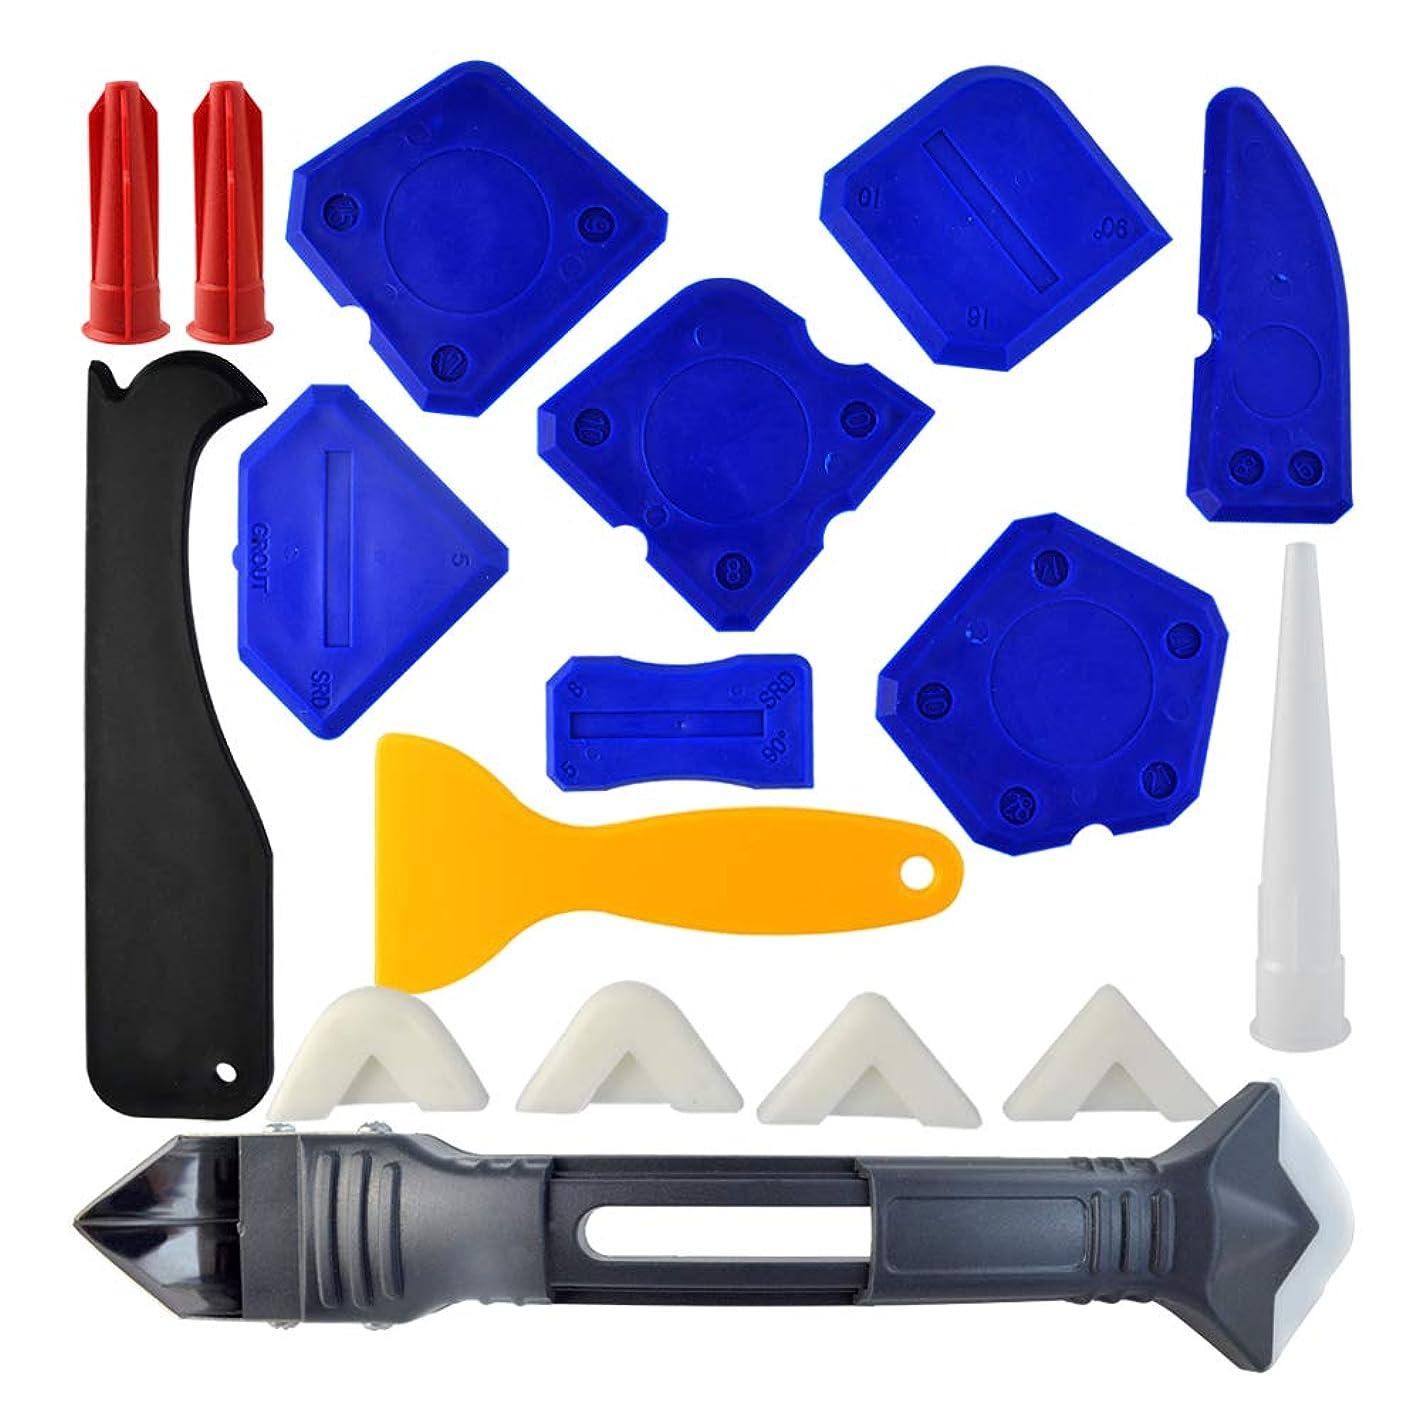 18 Pieces Caulking Tool Kit, Wobe 3 in 1 Caulking Tools Silicone Sealant Finishing Tool Grout Scraper Caulk Remover Caulk Nozzle Caulk Caps 5 Replaceable Pads for Bathroom Kitchen Sealing (Blue)